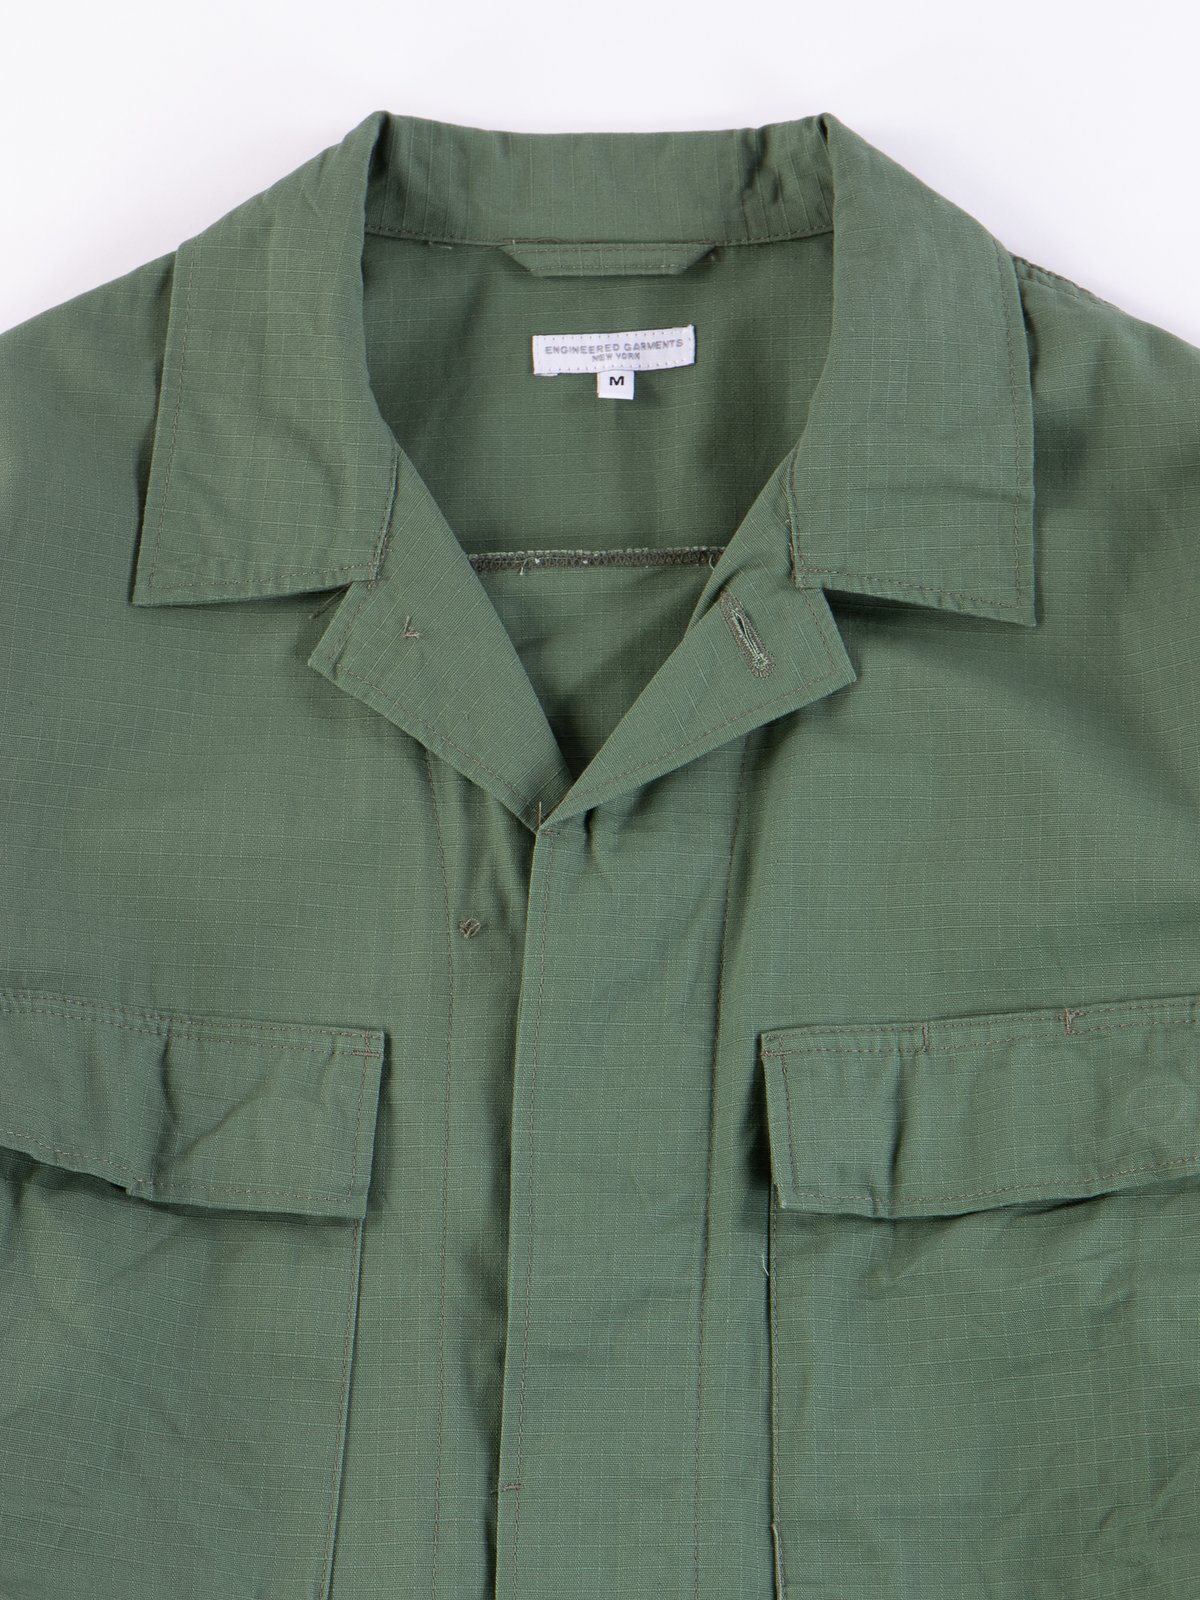 Olive Cotton Ripstop BDU Jacket - Image 3